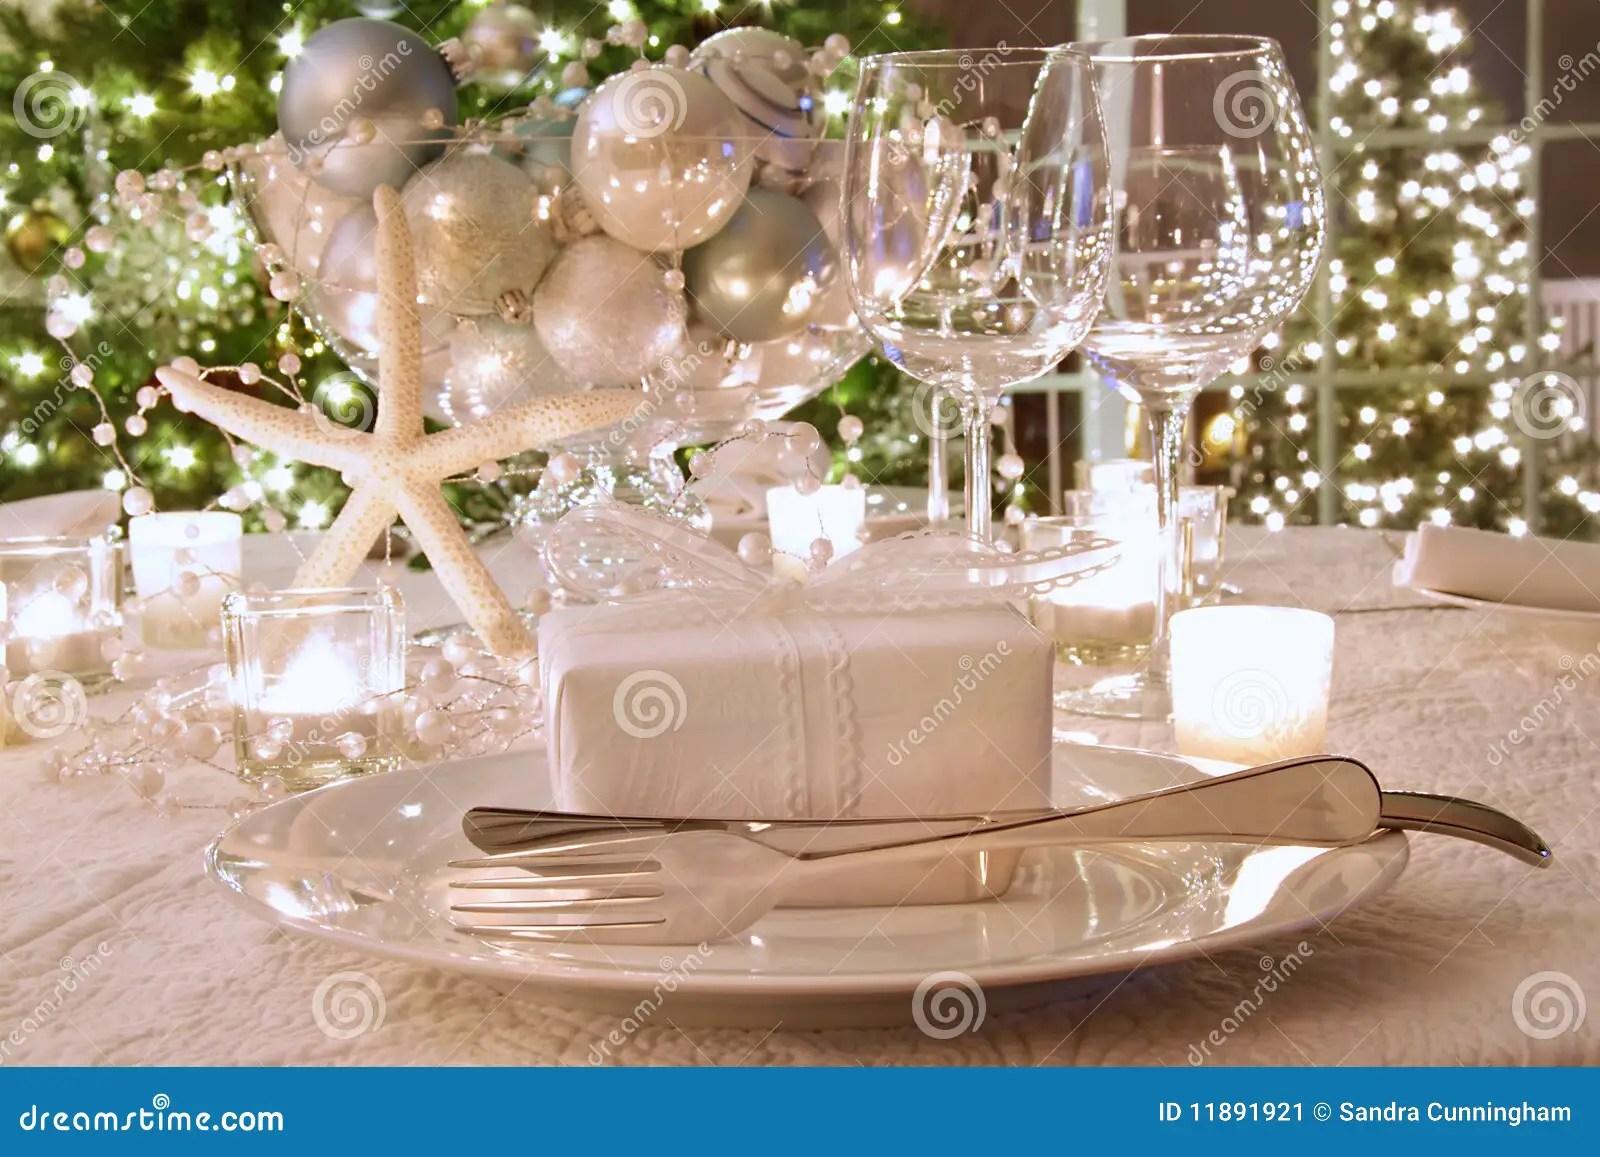 Christmas Tree Wallpaper 3d Elegantly Lit Holiday Dinner Table Stock Image Image